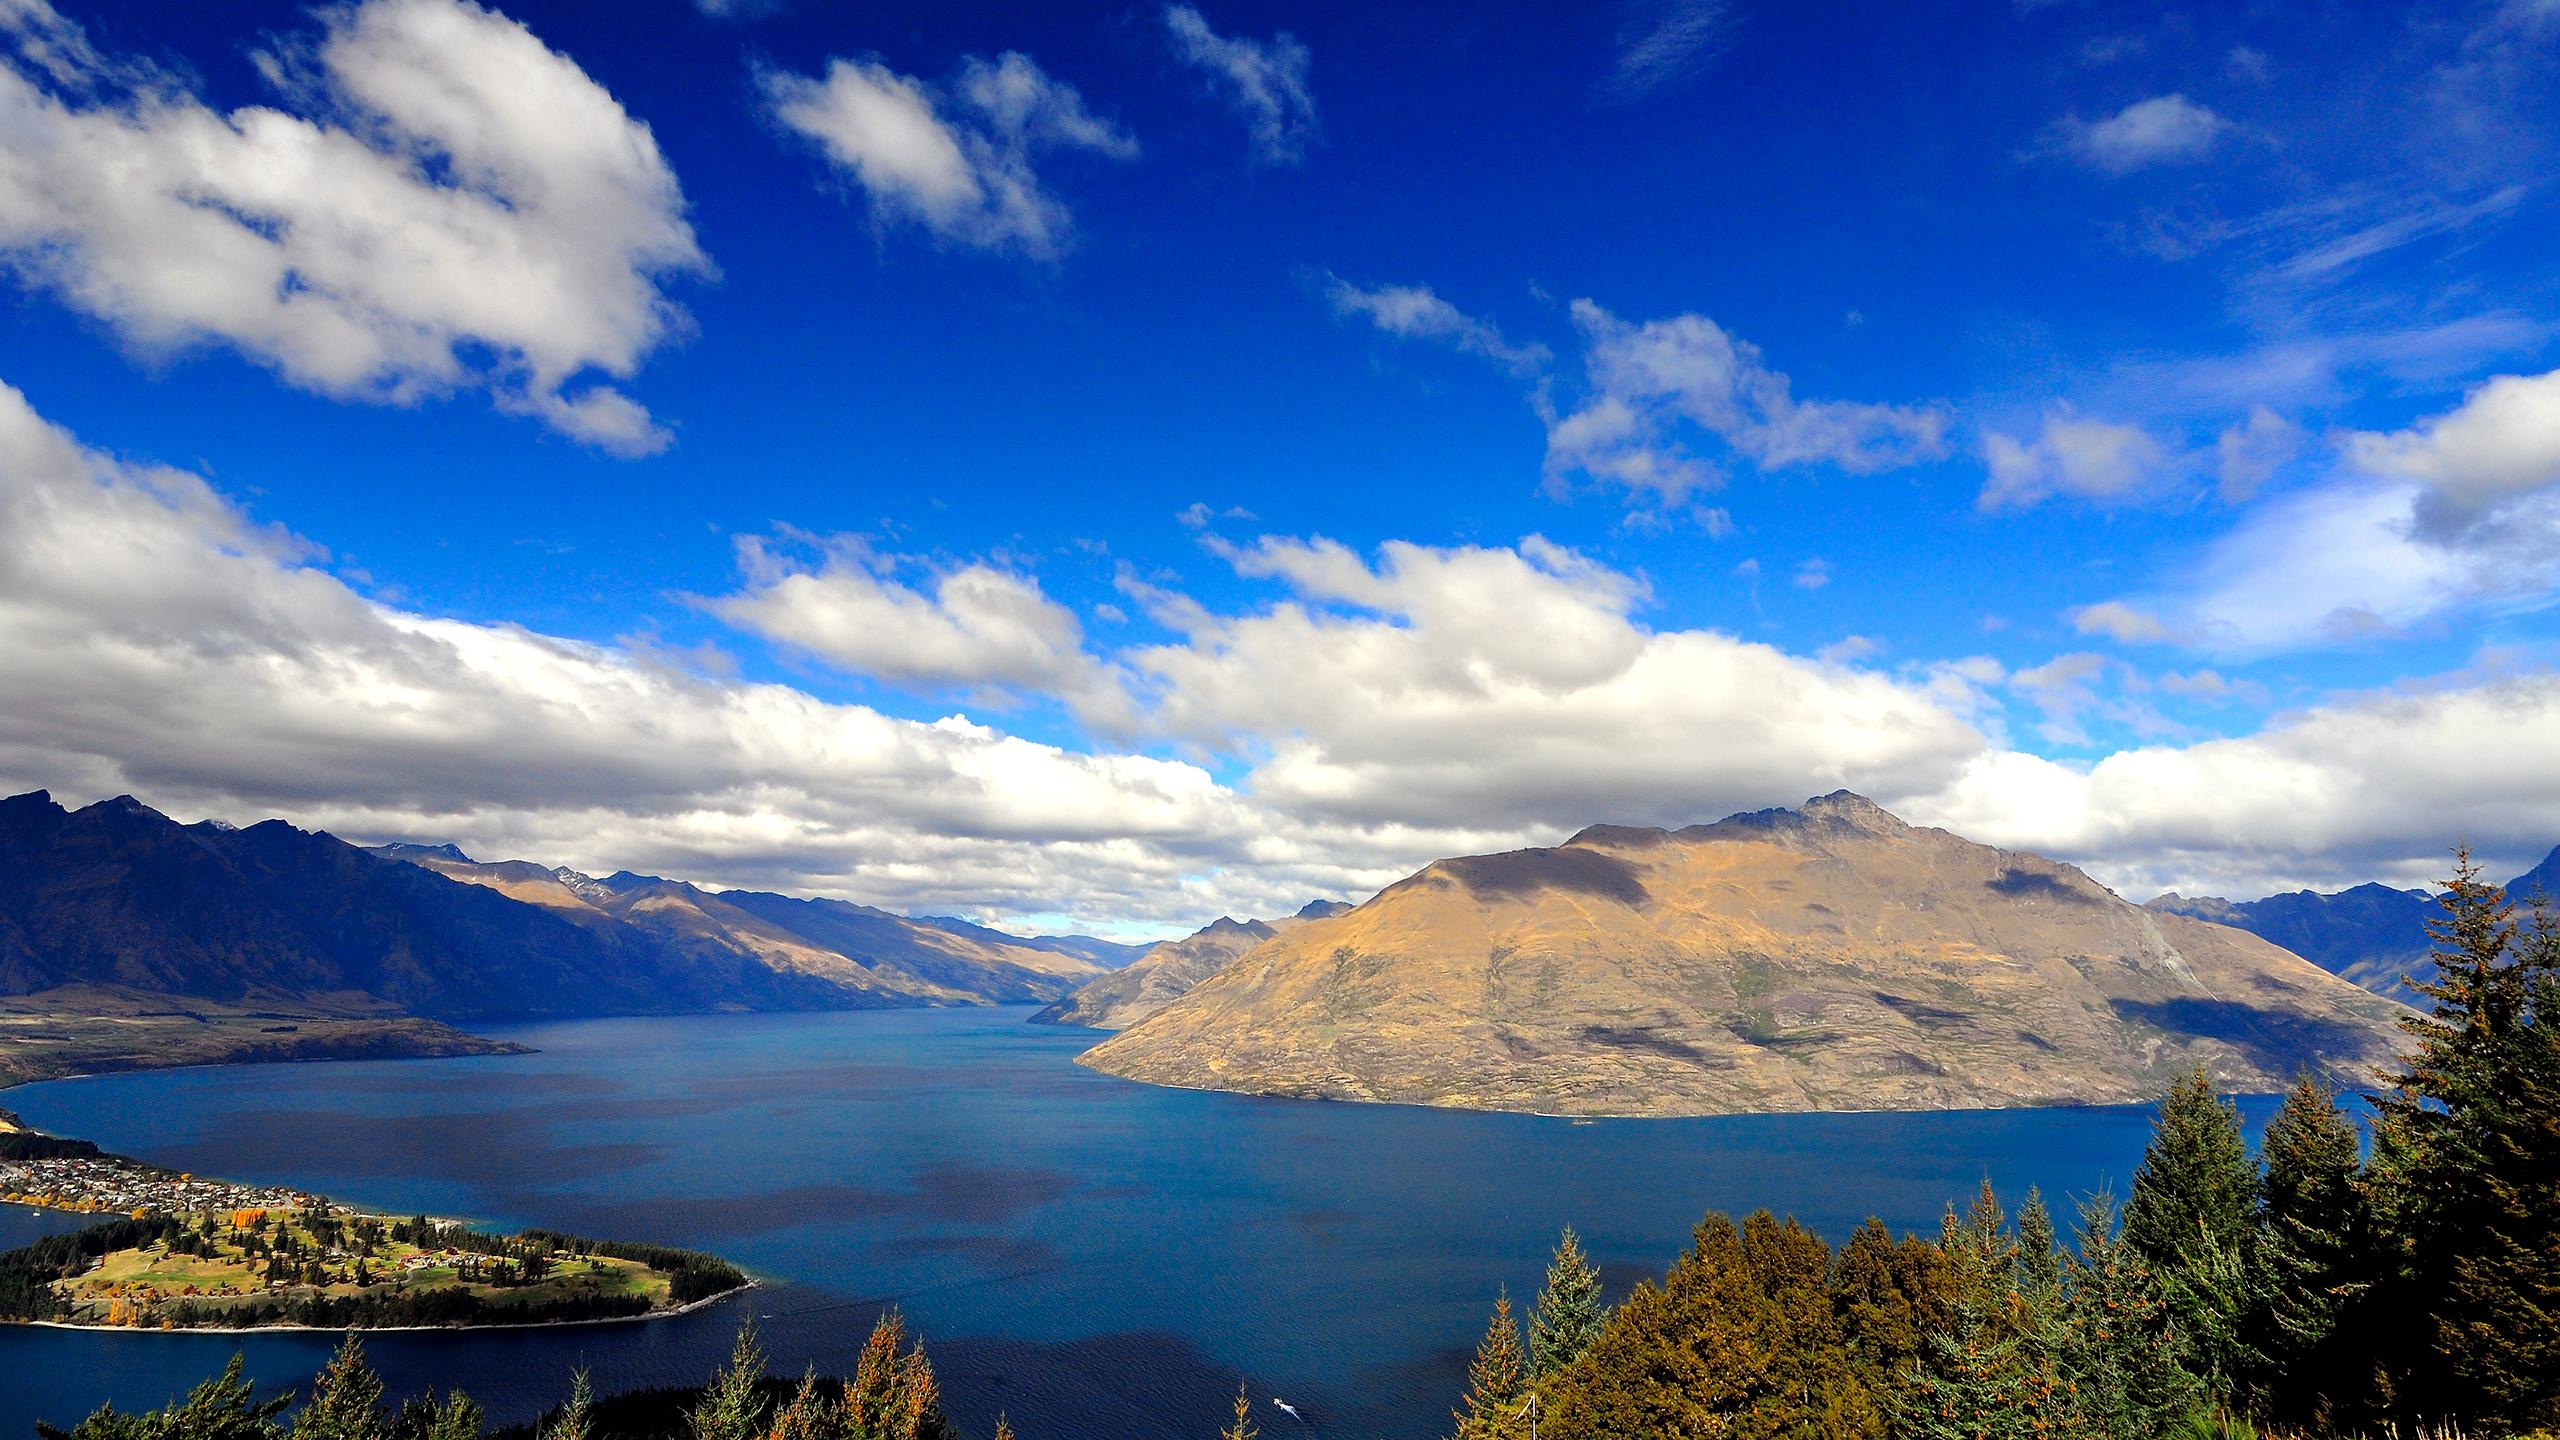 lake_scenery